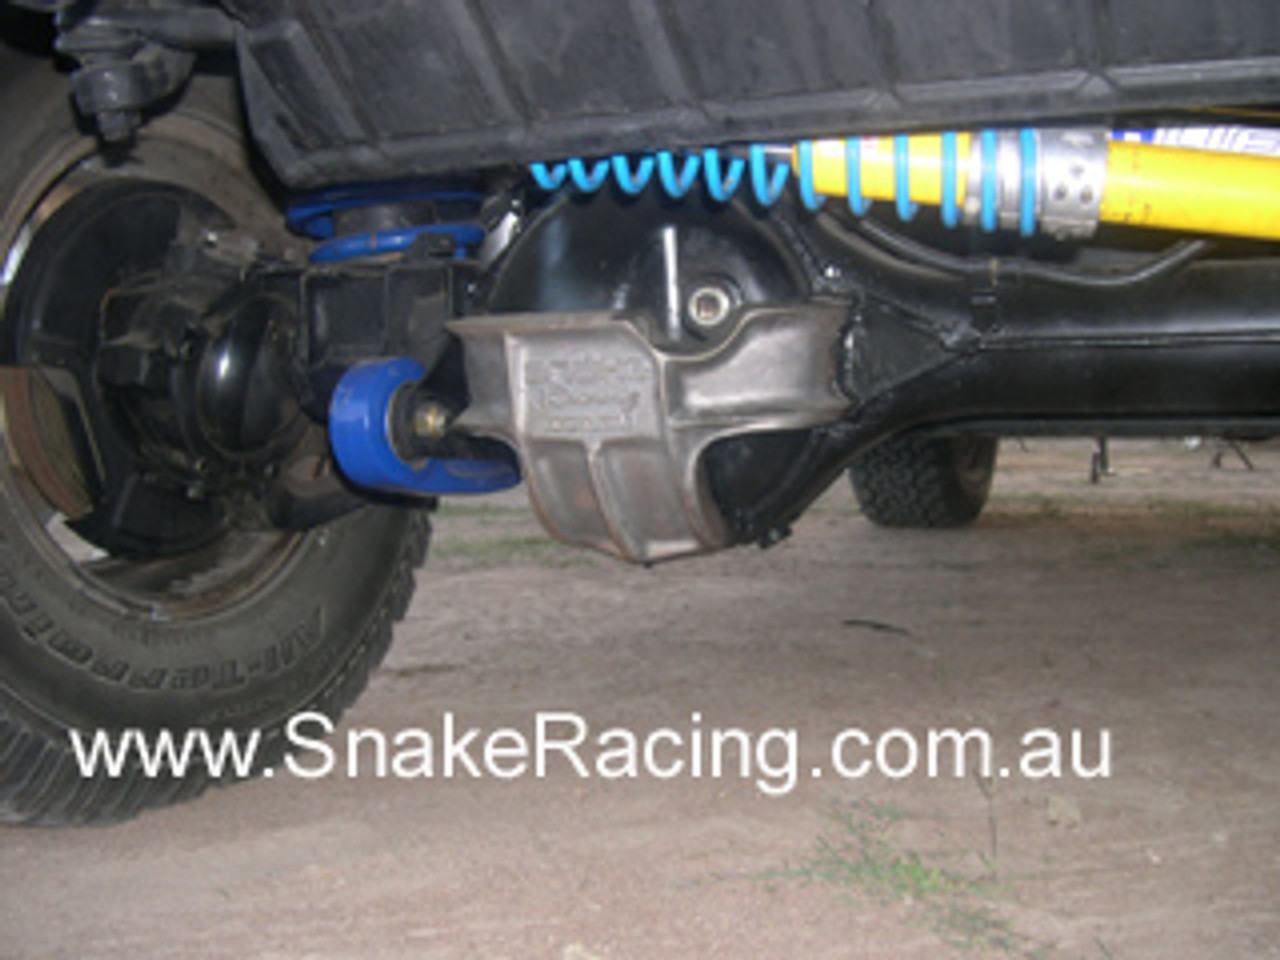 LandCruiser 80 Series Front Diff Guard - Snake Racing